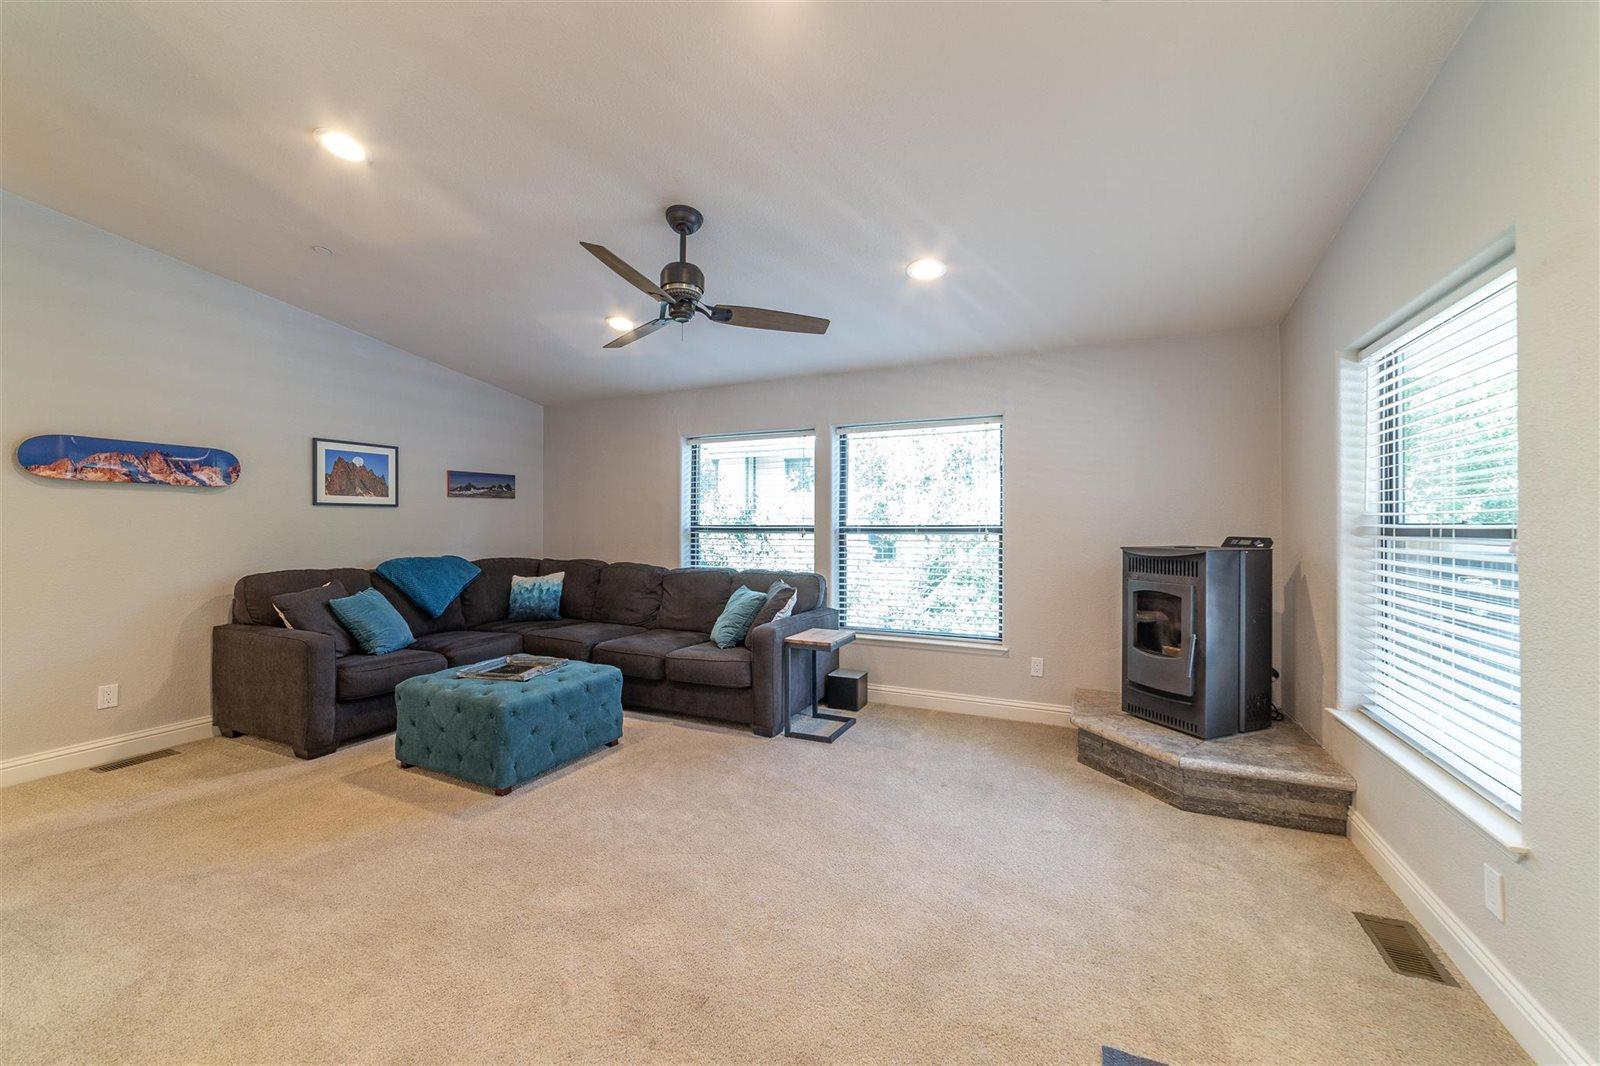 450 Lupin St., Mammoth Lakes, CA 93546